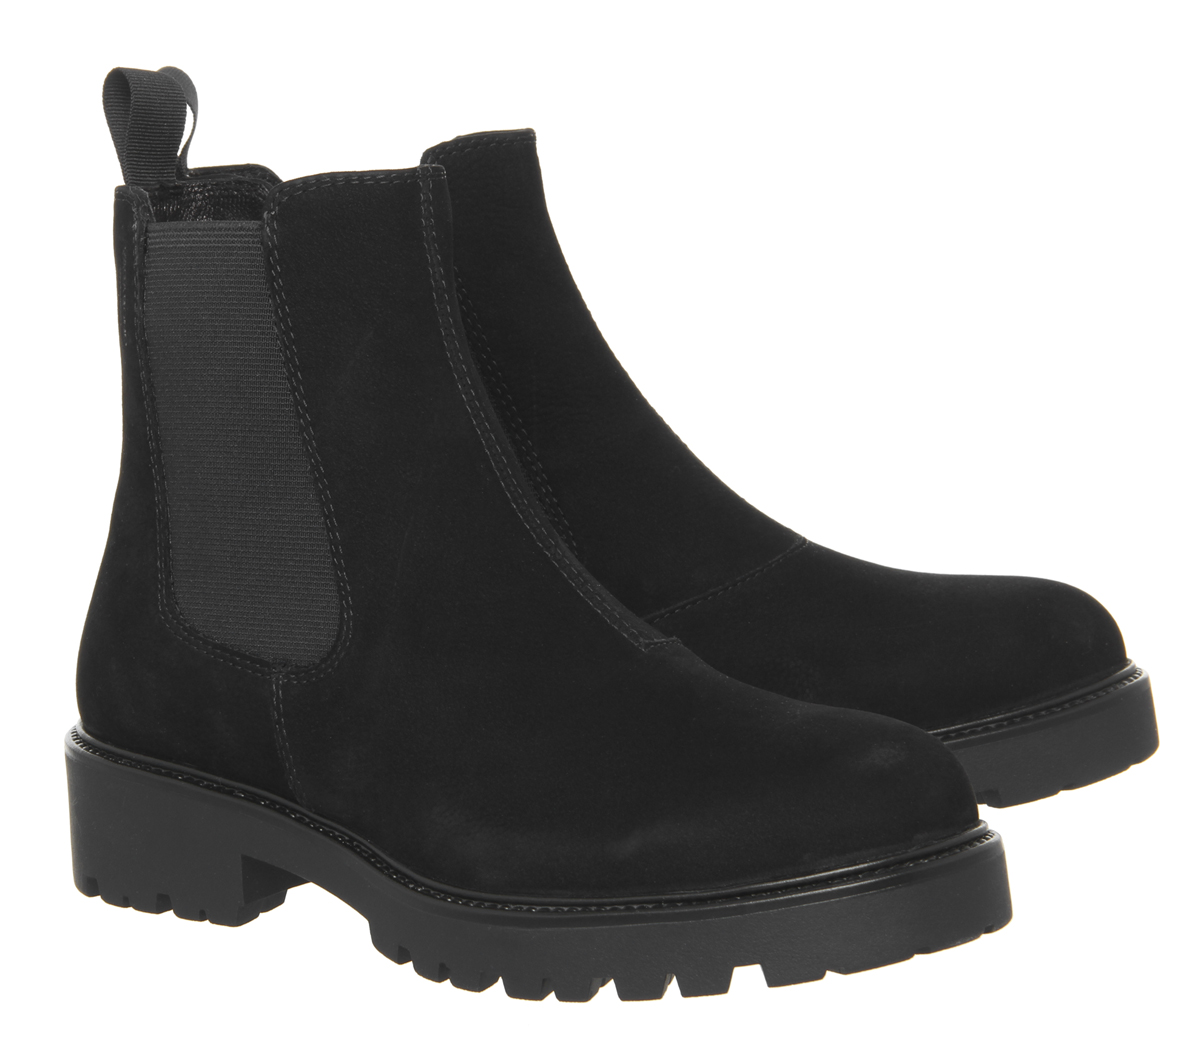 Womens Vagabond Kenova Chelsea Boots Black Nubuck Boots